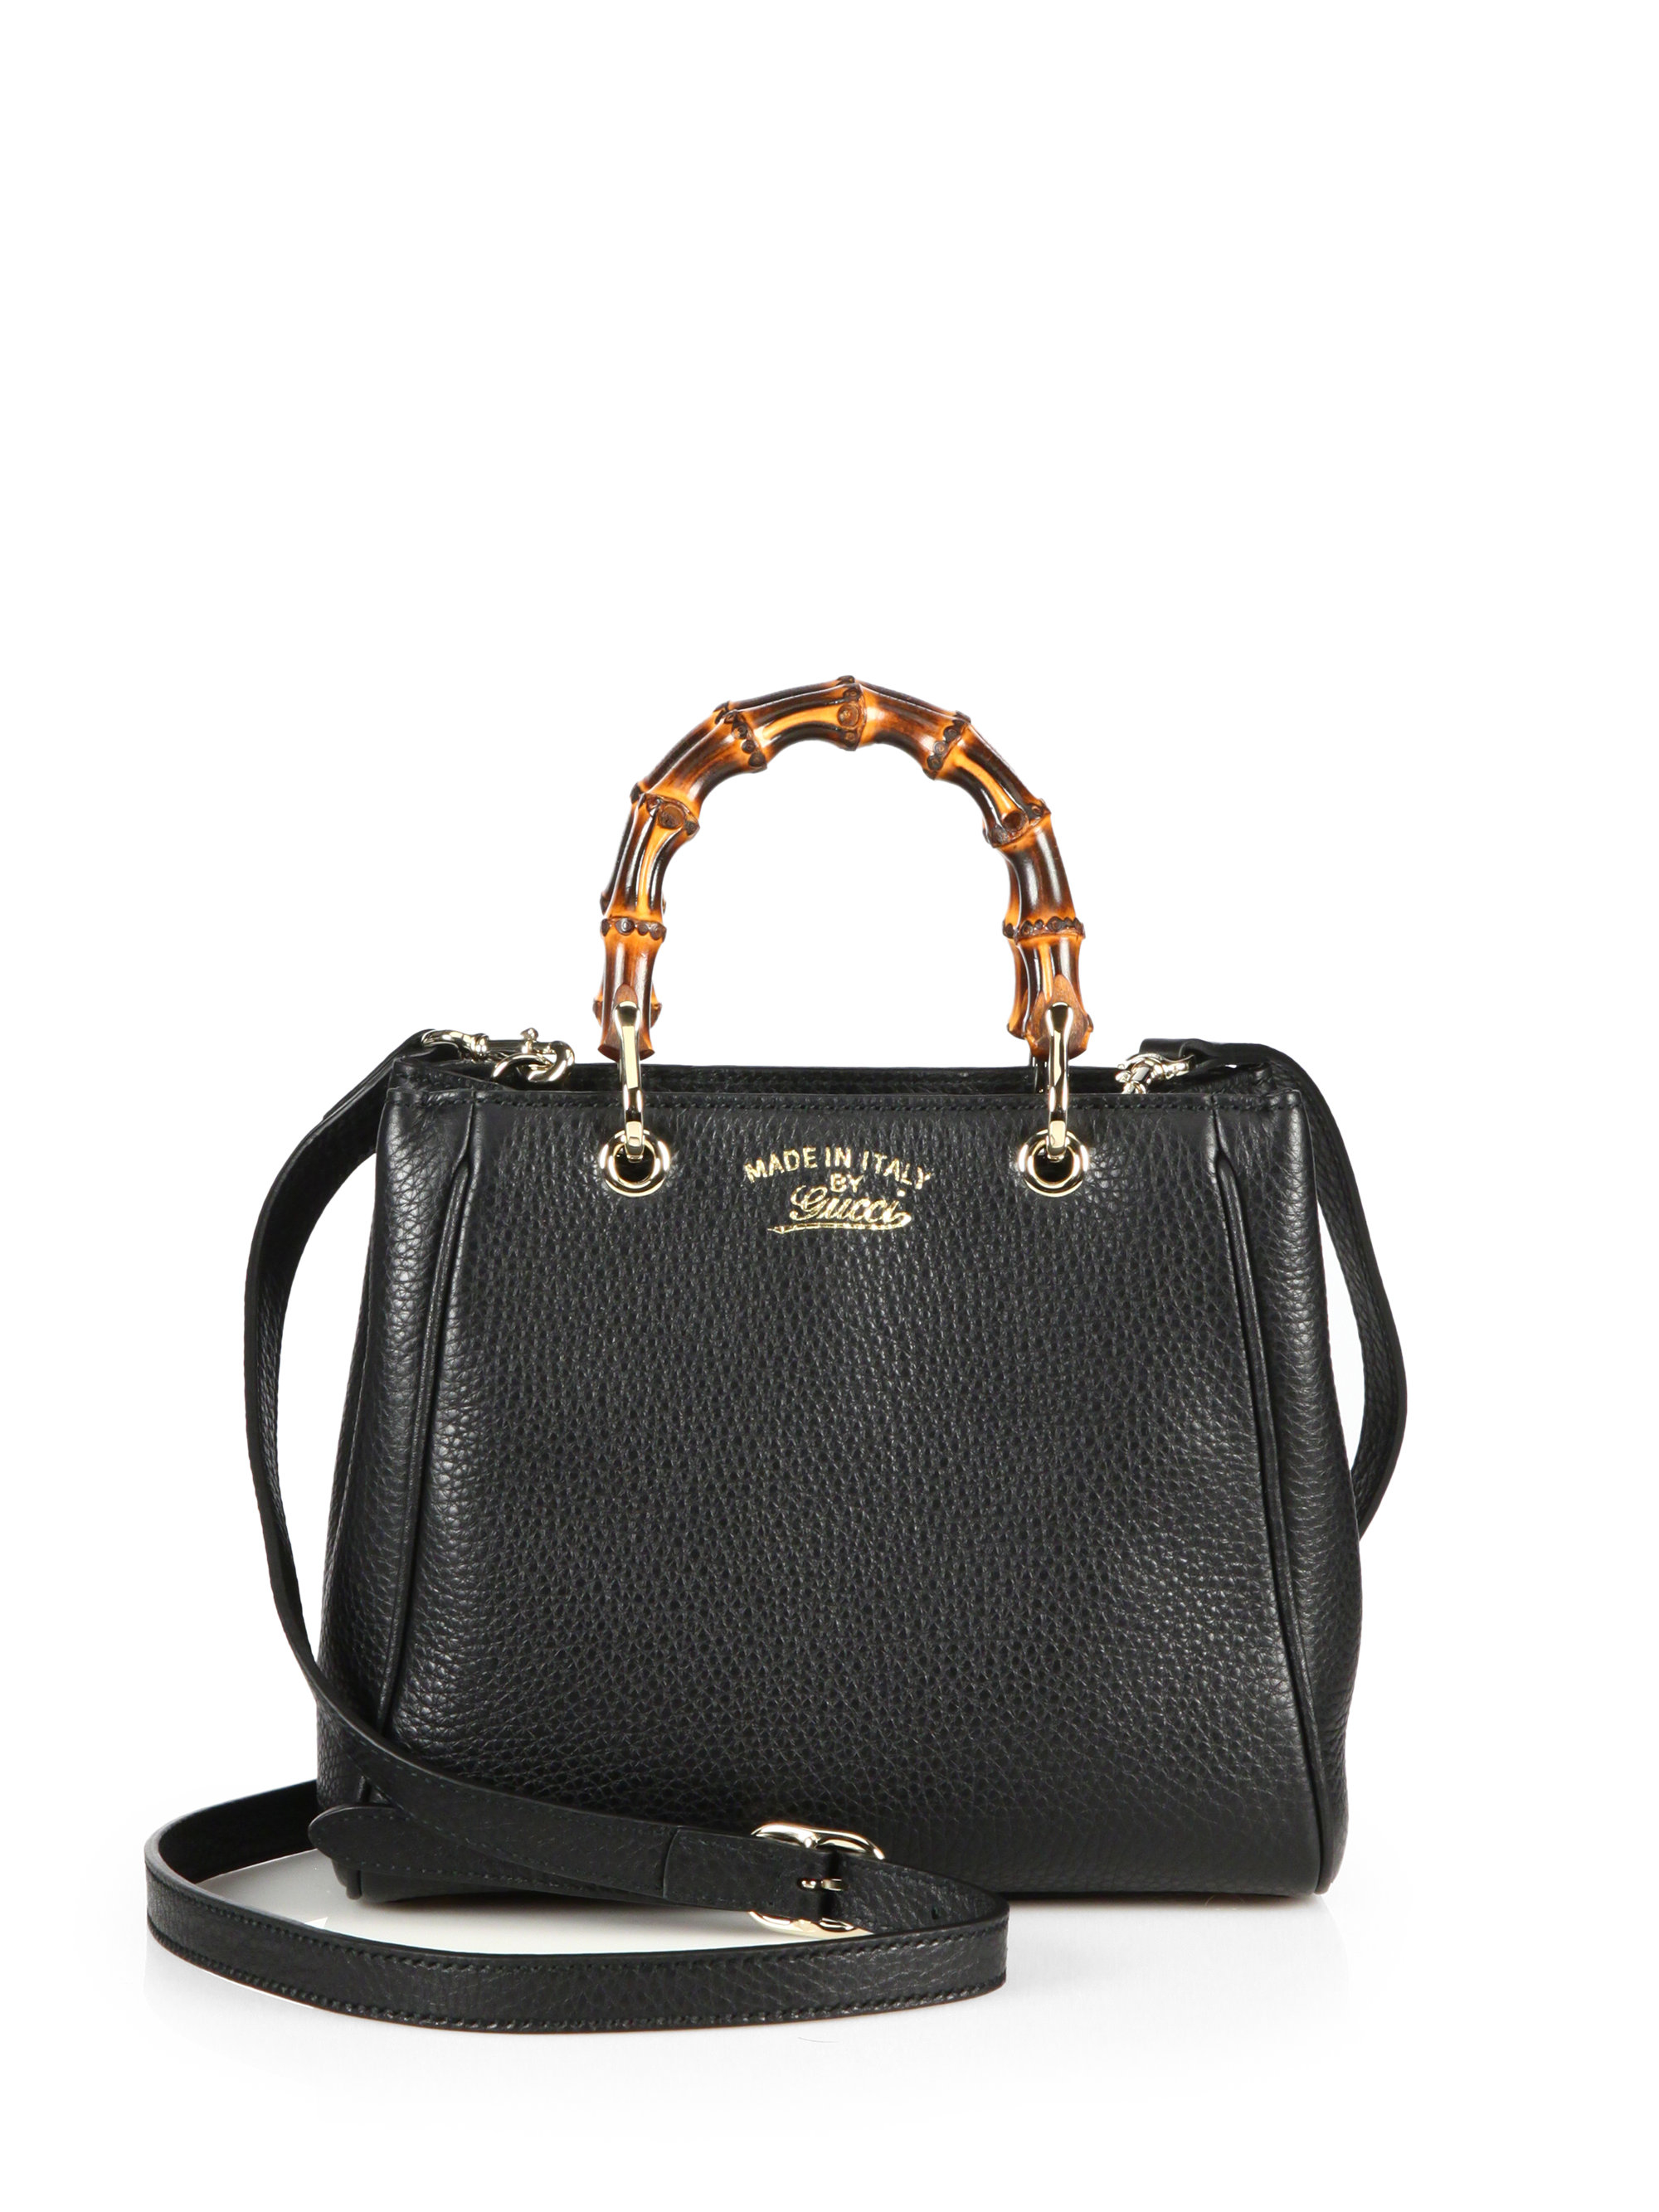 cfd9d035c Gucci Bamboo Shopper Mini Bag. Gucci Bamboo Shopper Mini Leather Top Handle  Bag in Black | Lyst